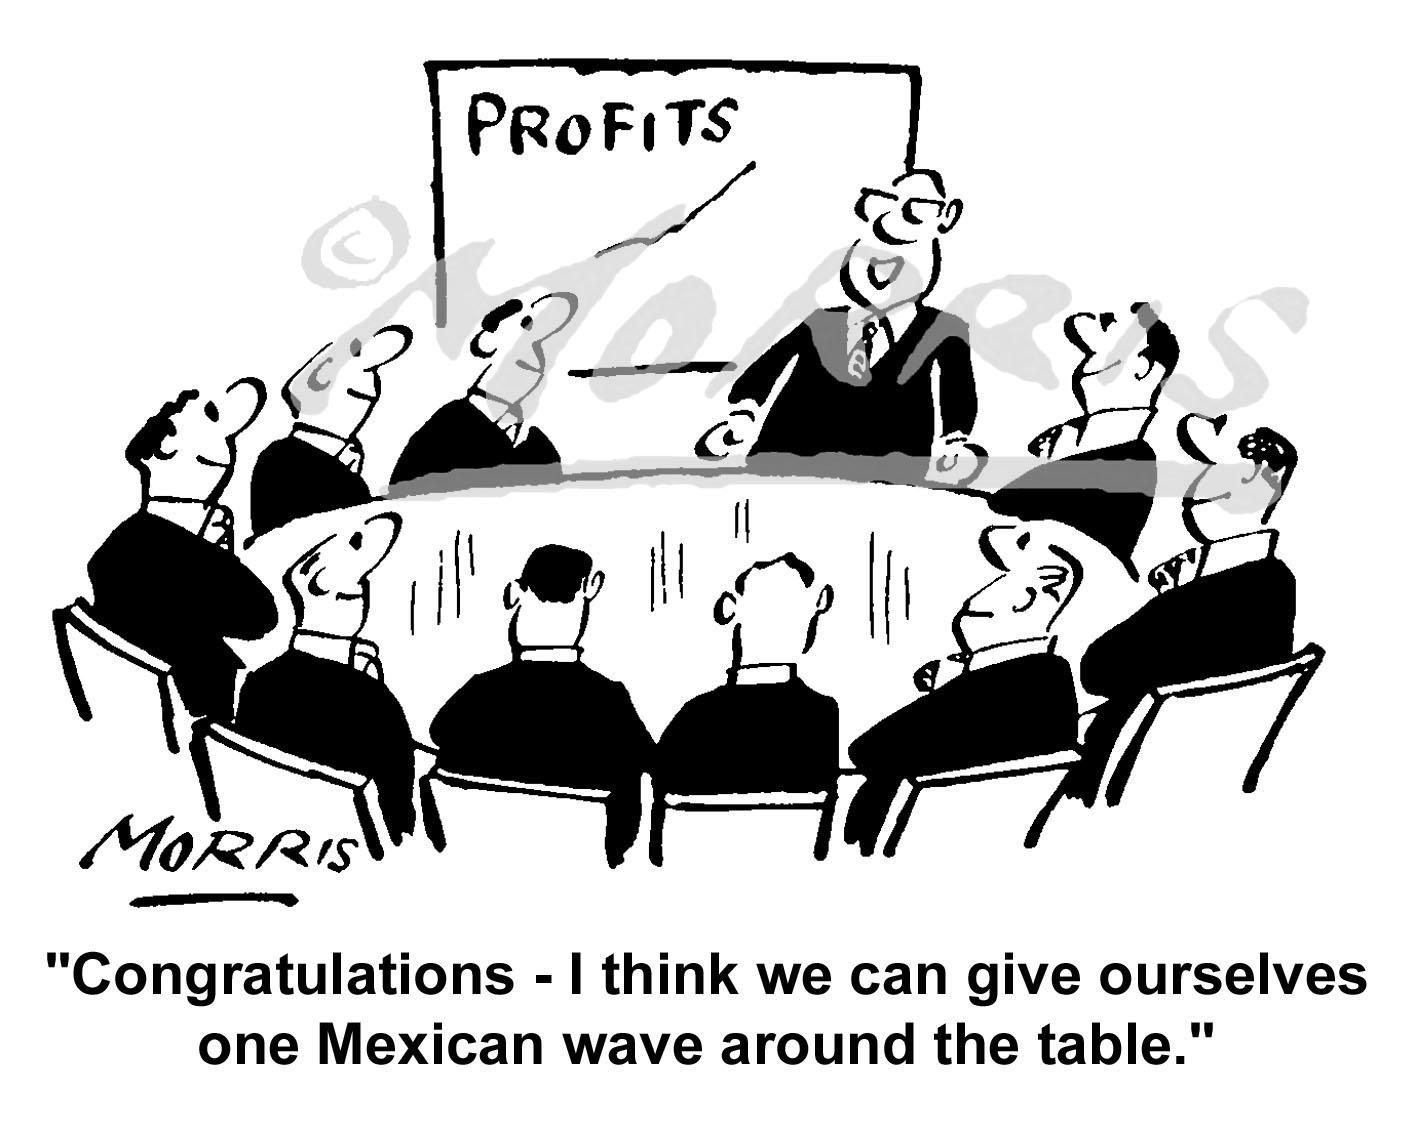 Boardroom profits graph comic cartoon – Ref: 1475bw